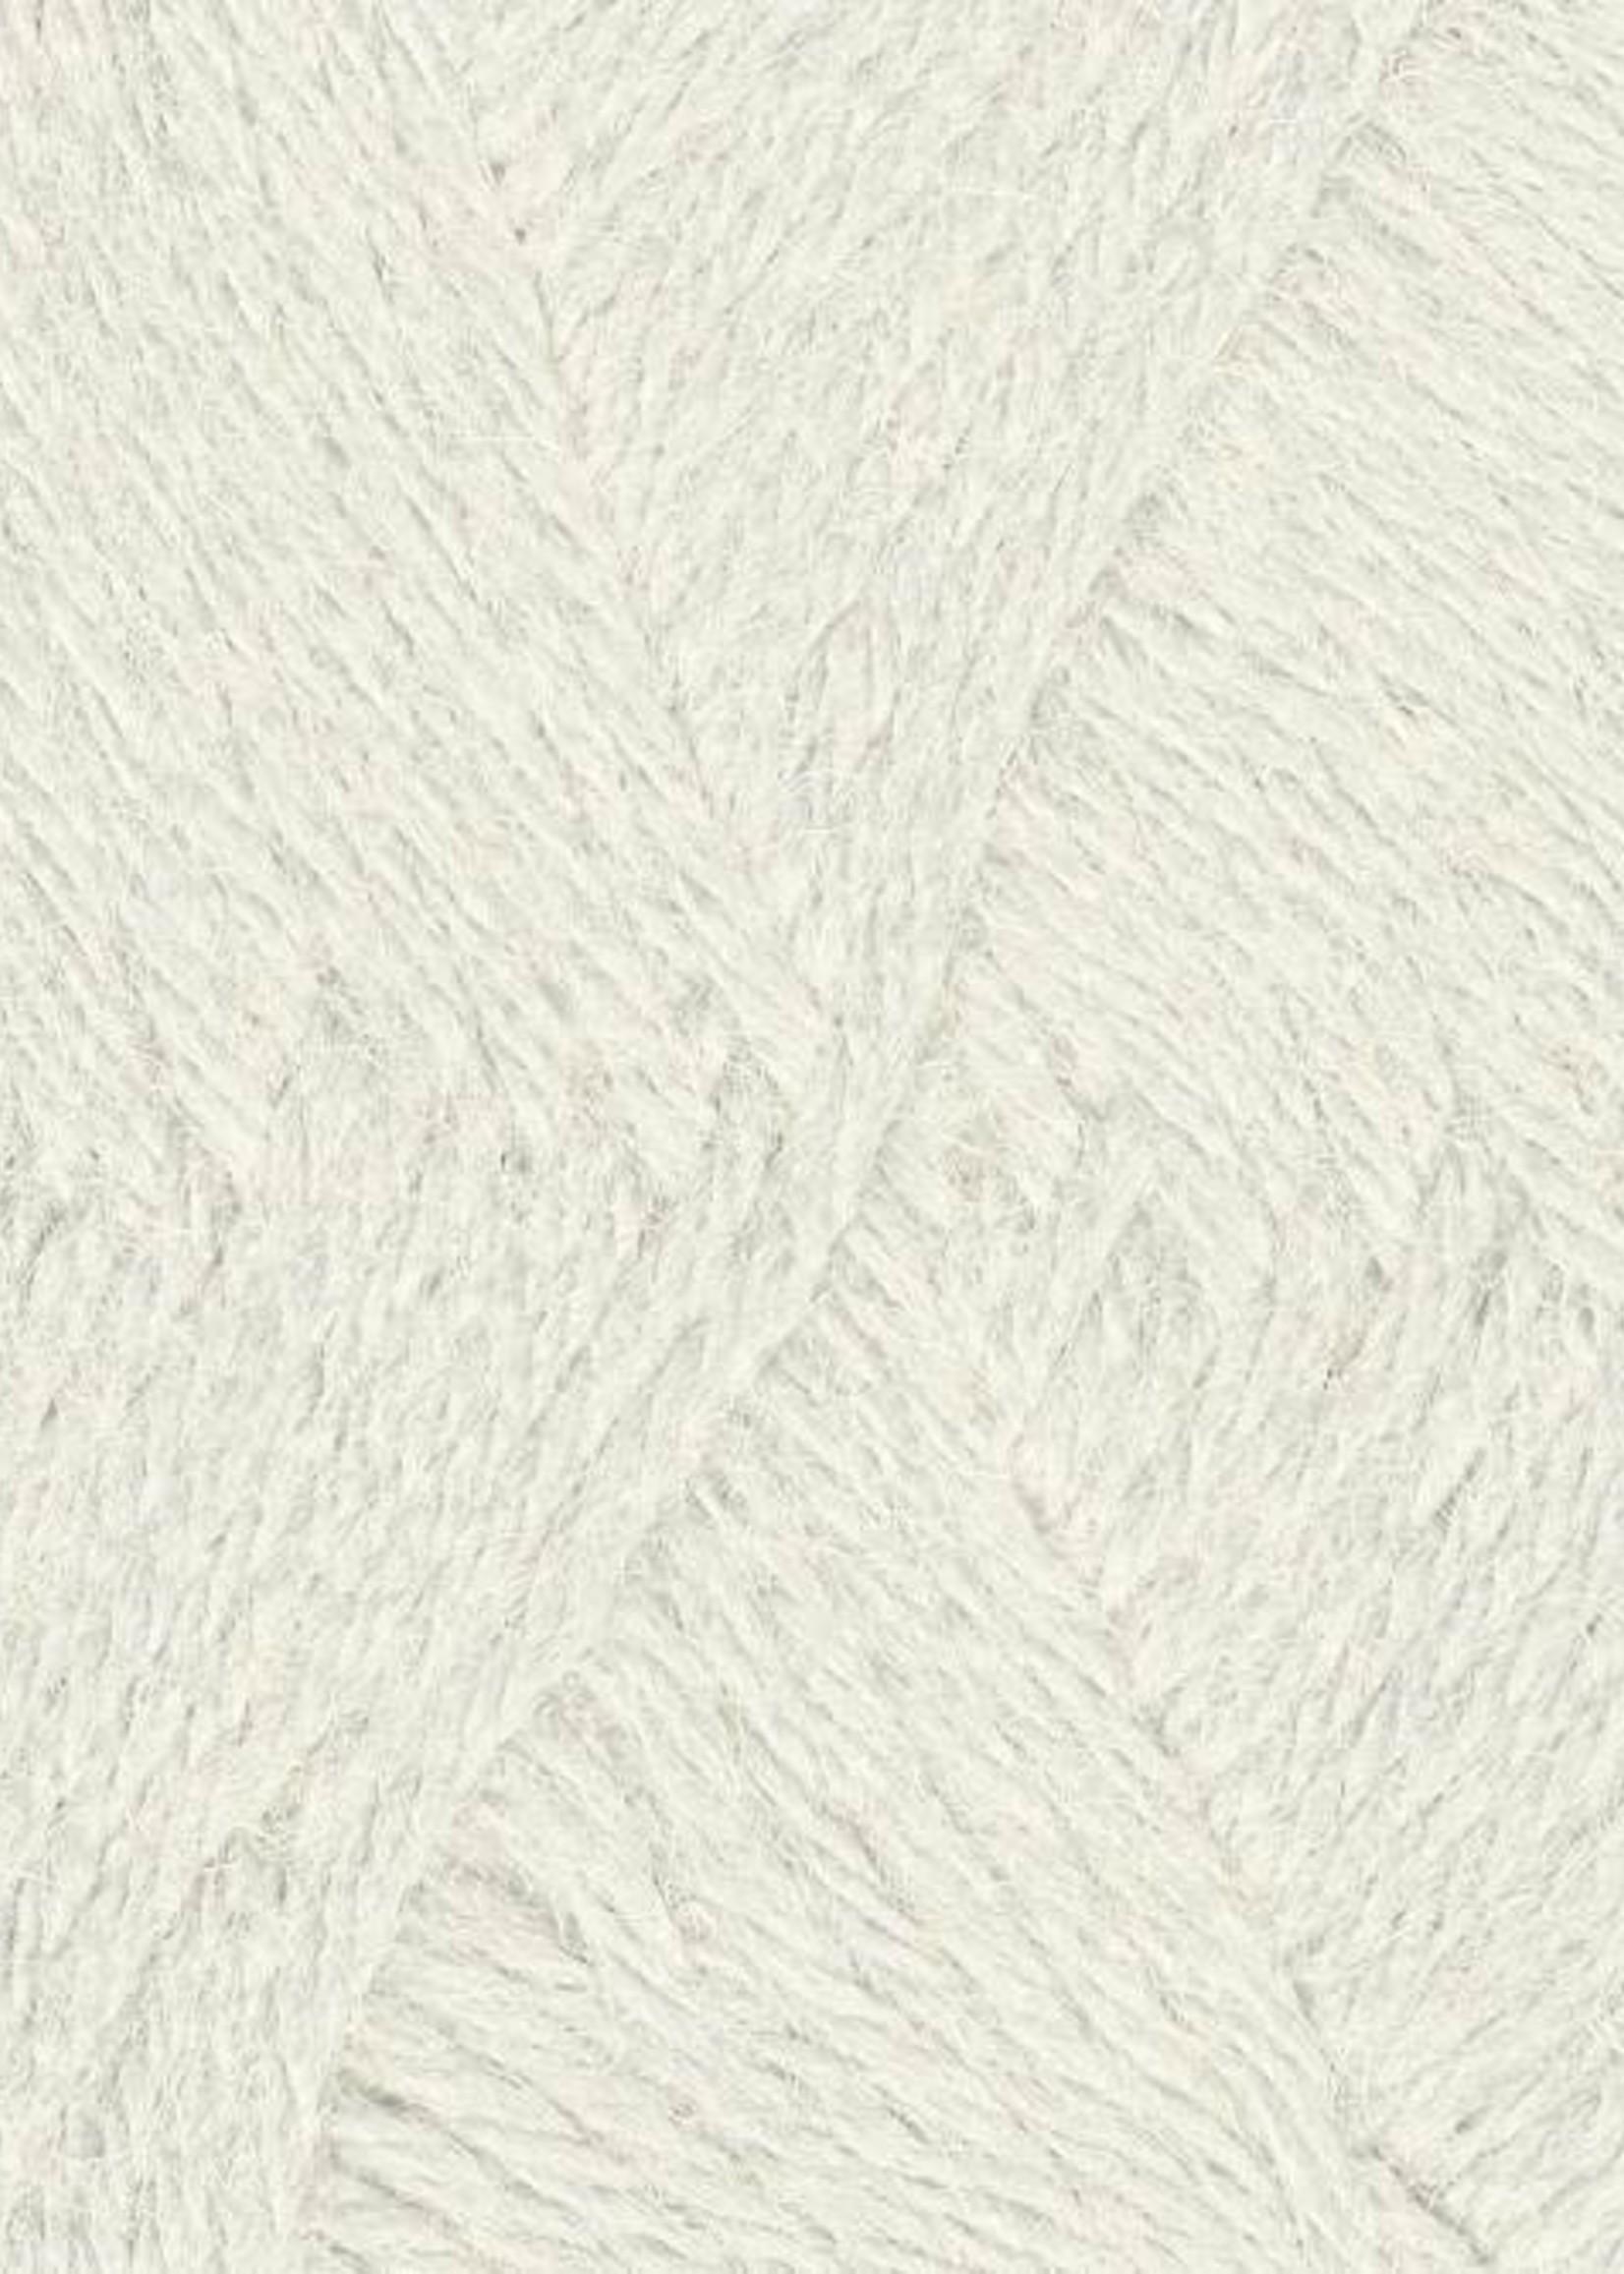 Knitting Fever KFI Collection Teenie Weenie Wool - Ecru